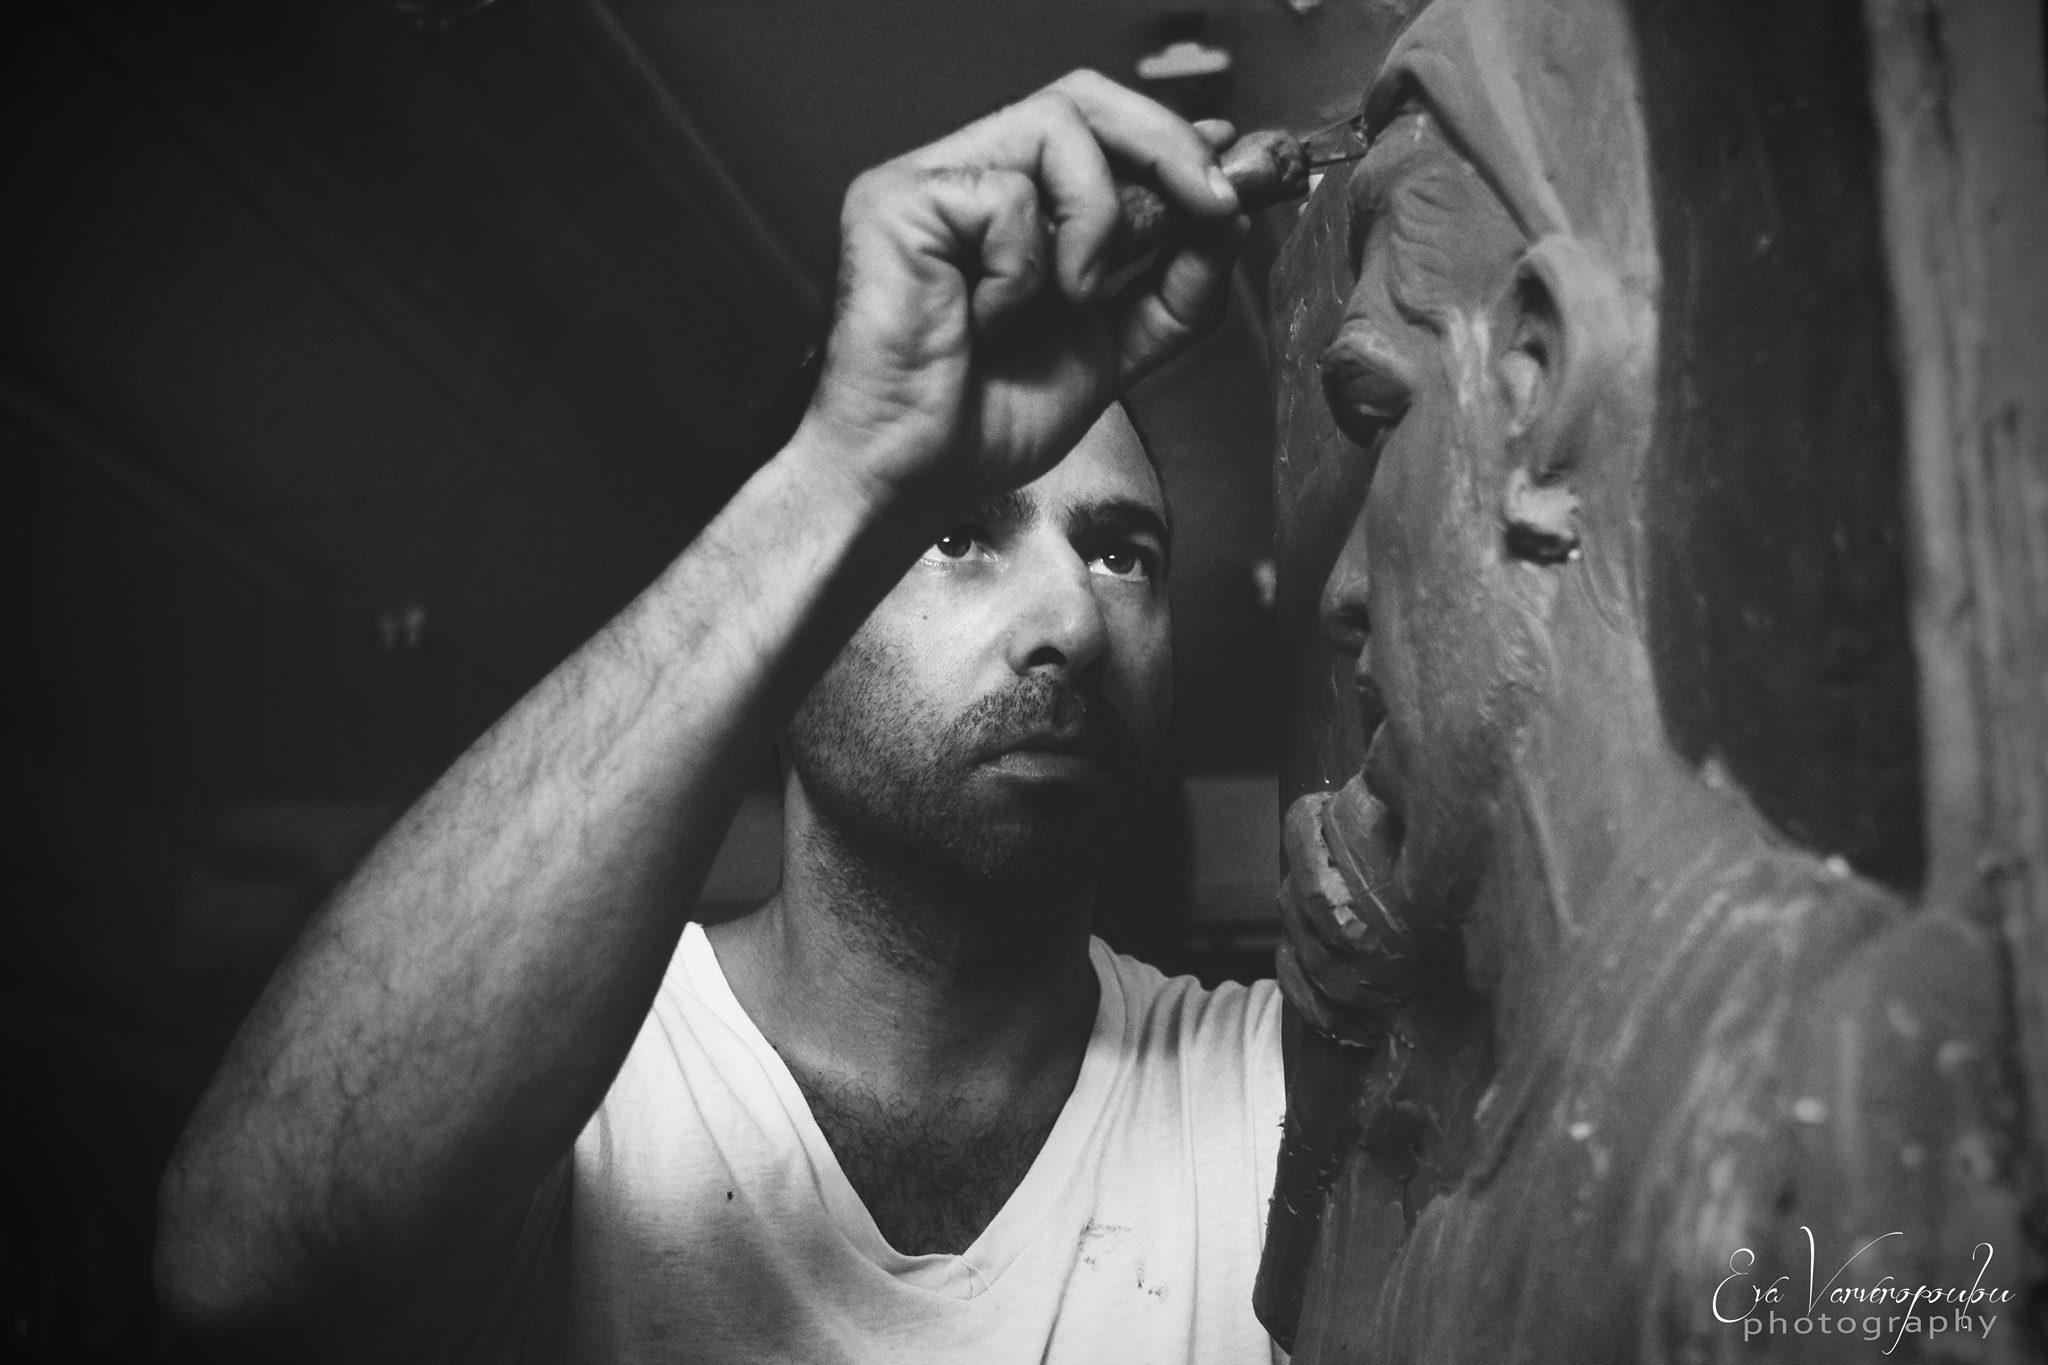 Stathis Alexopoulos sculptor/designer